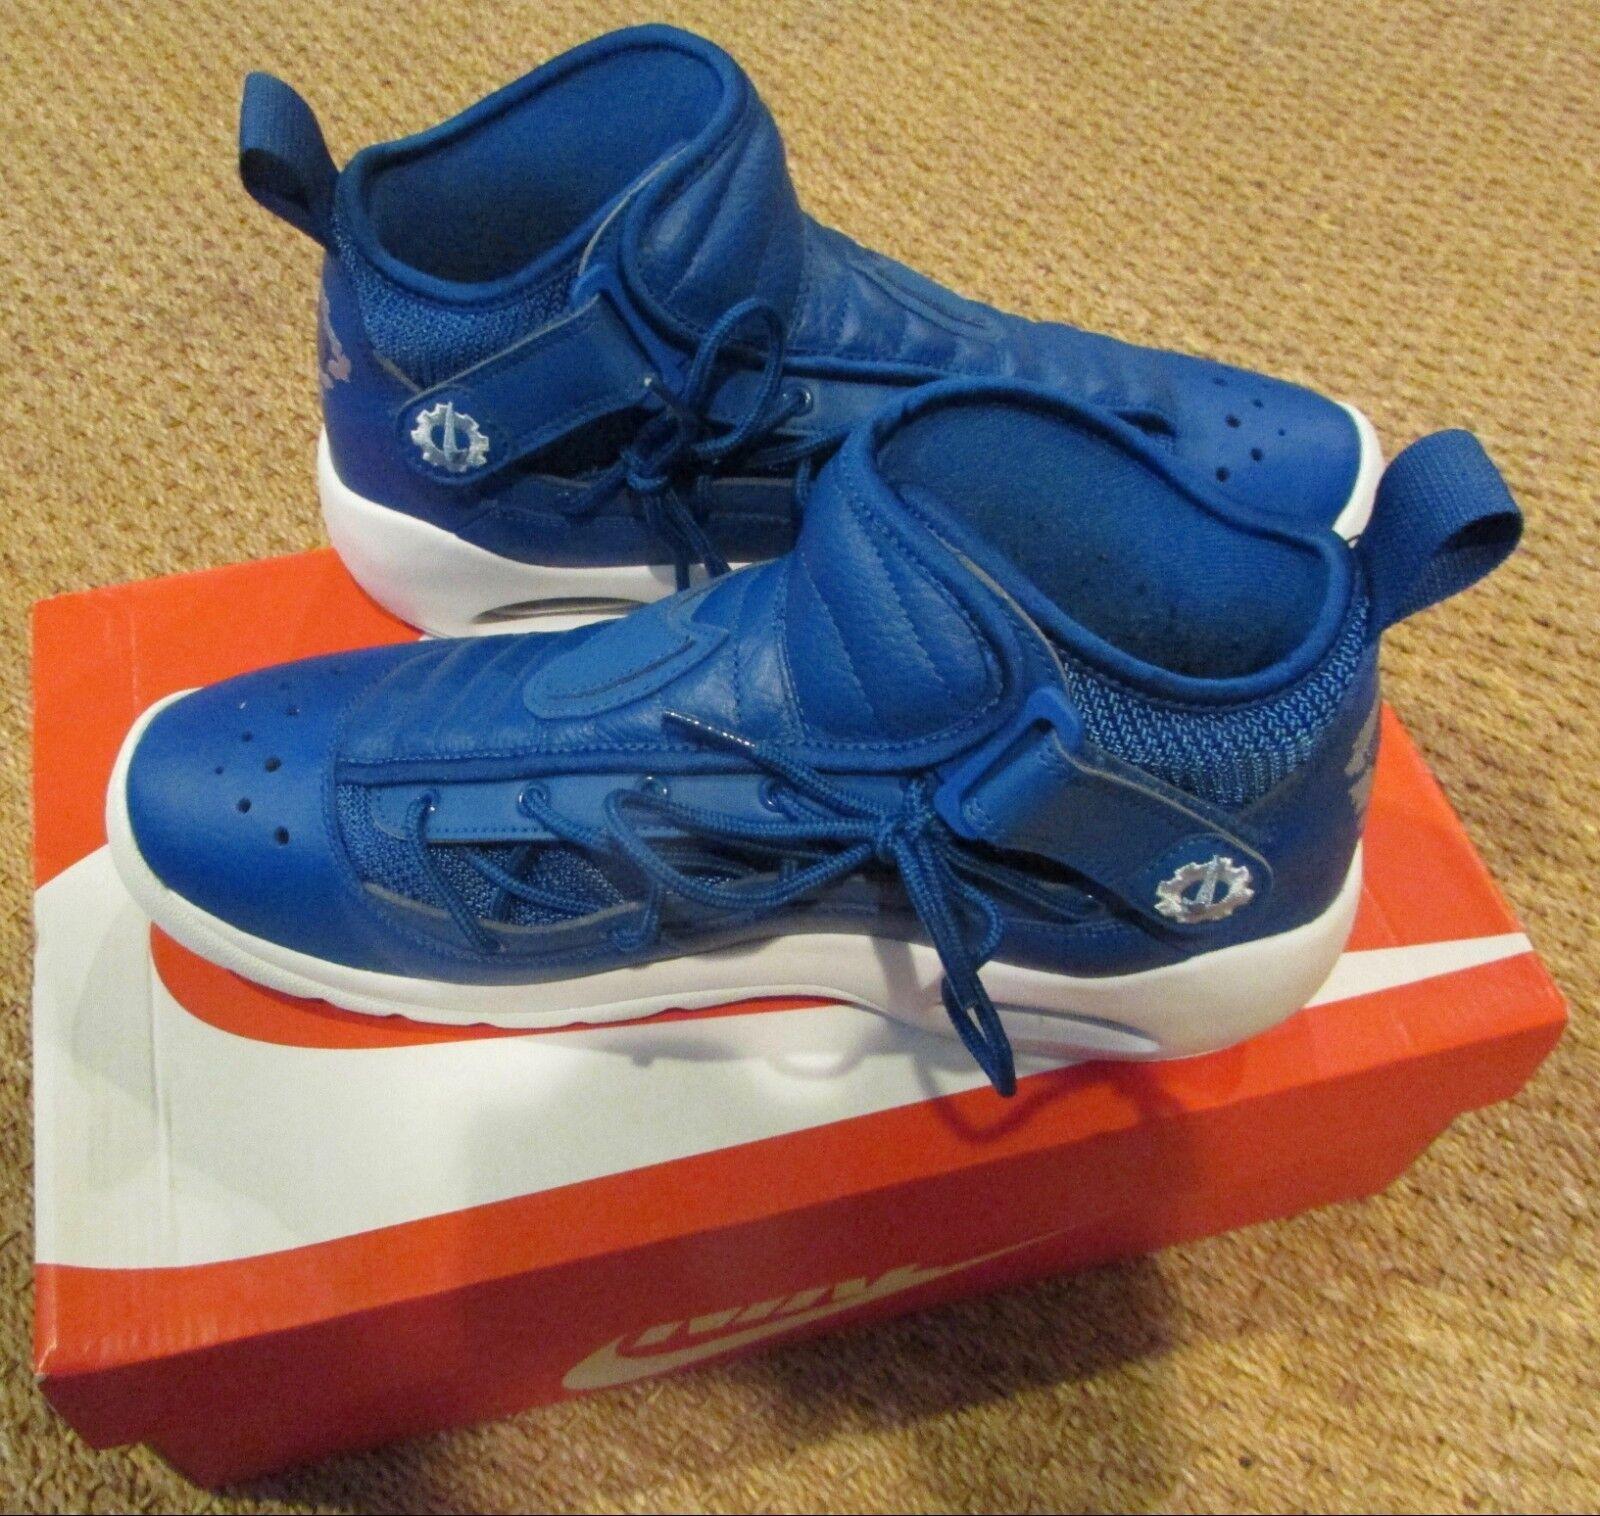 Nike Air Shake Shake Shake Ndestrukt Uomo Scarpe Blue/White 880869-401 Taglia 11 Rodman 42b56b